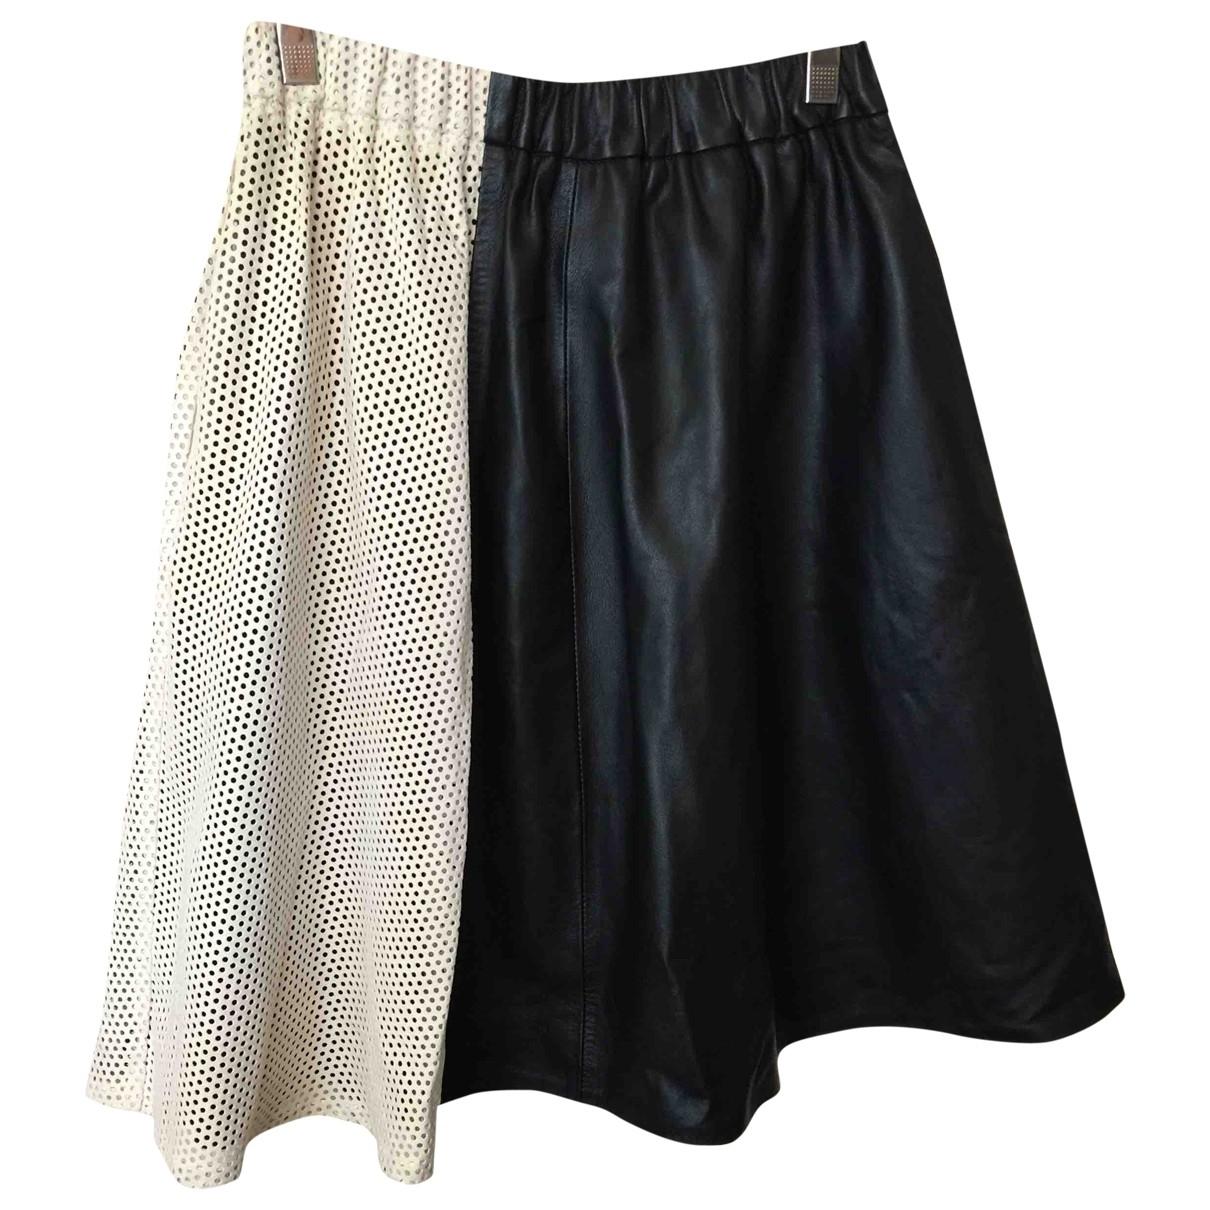 Essentiel Antwerp \N Black Leather skirt for Women 38 FR